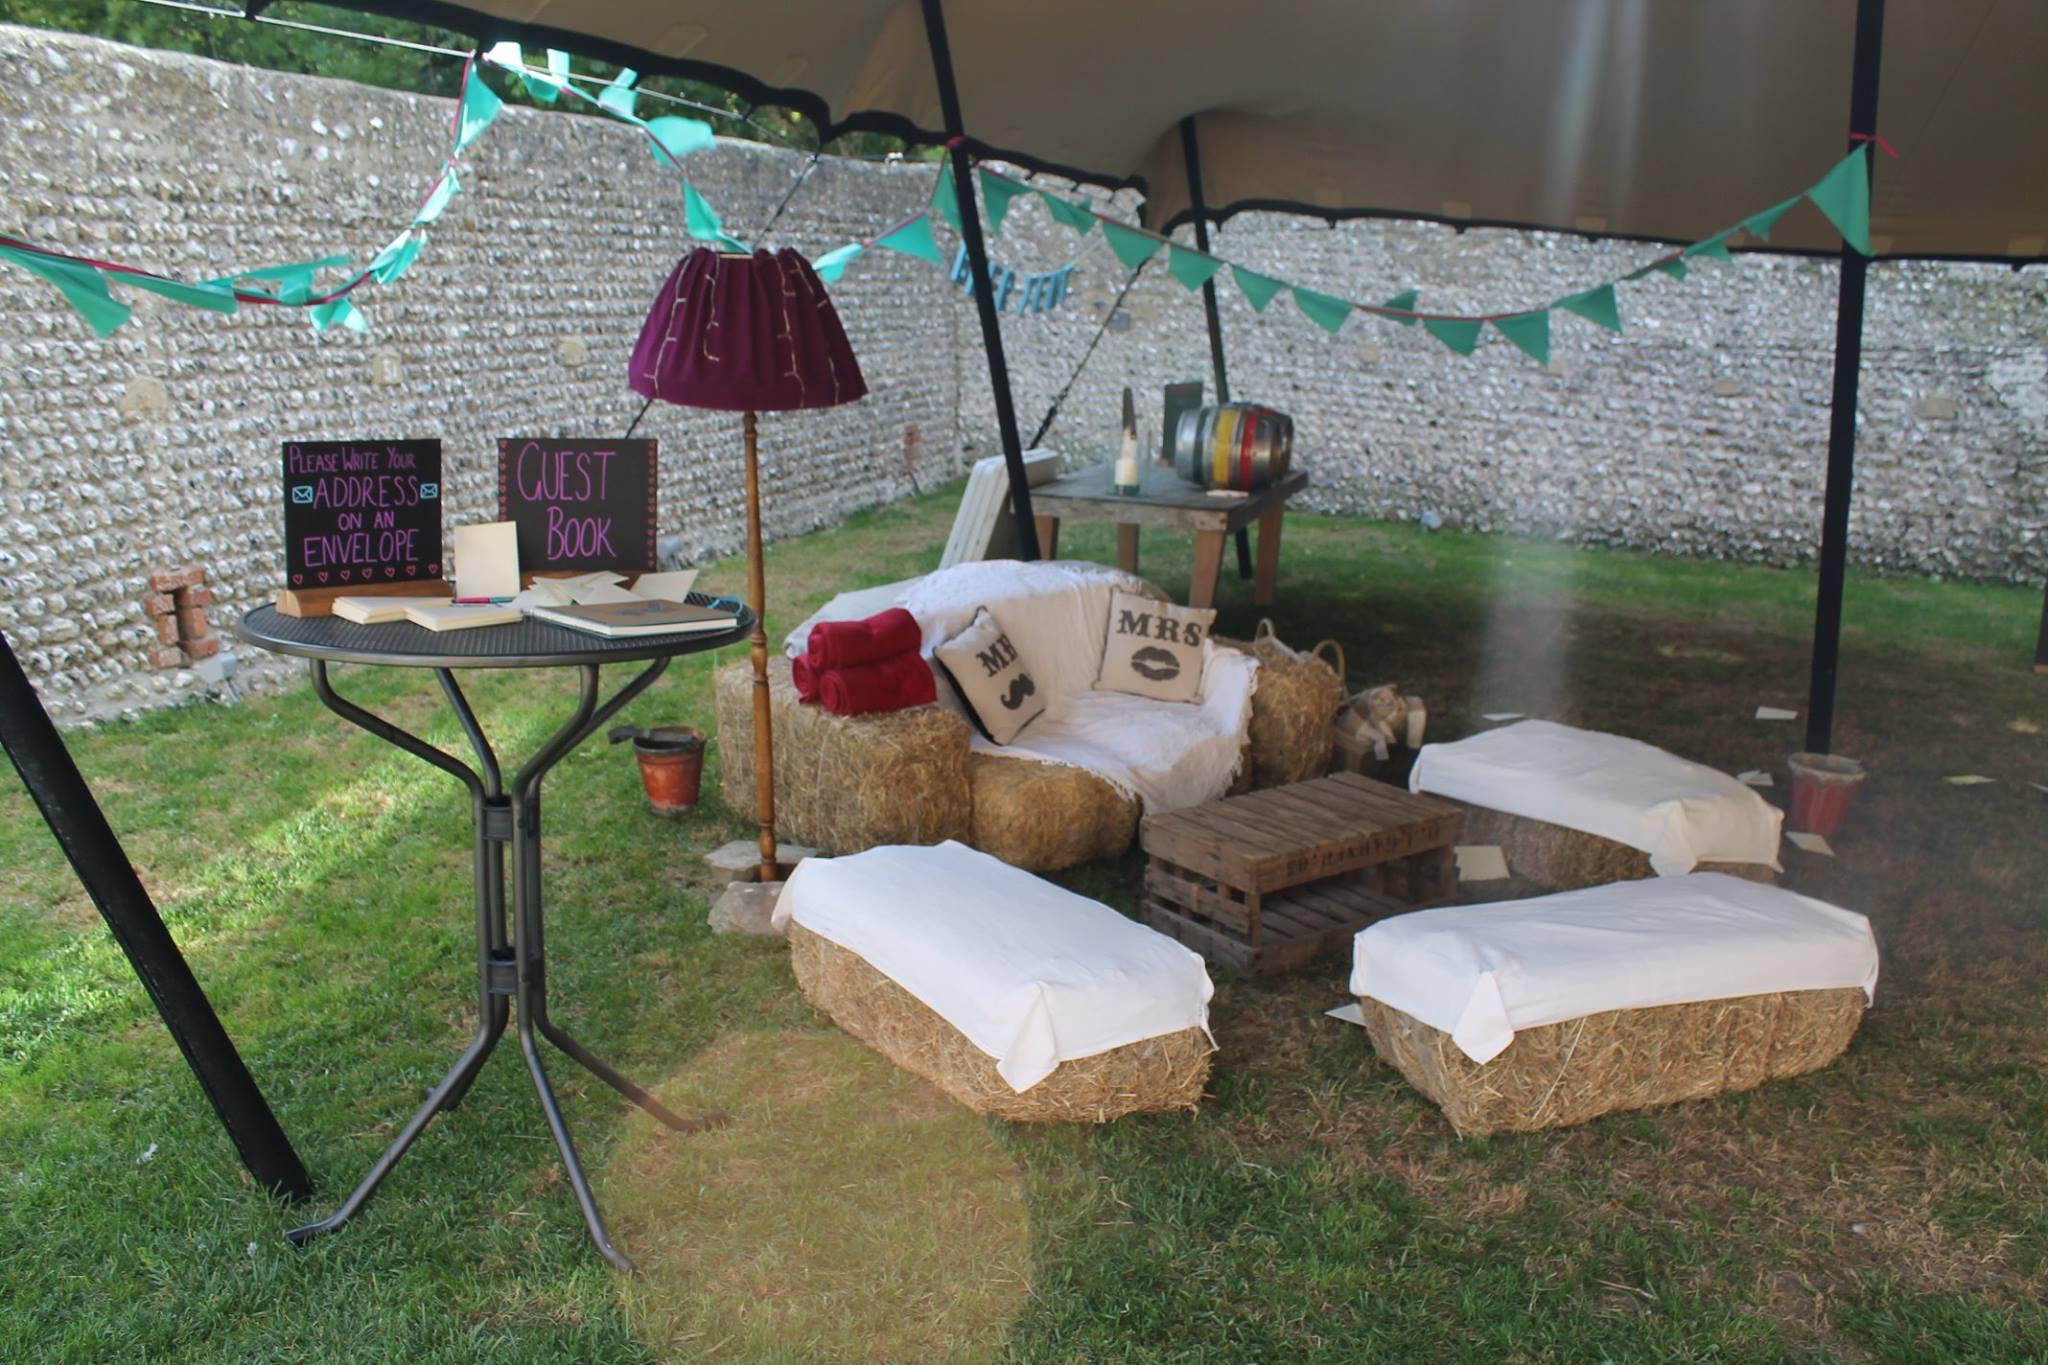 hay bale sofa and blankets 2.jpg